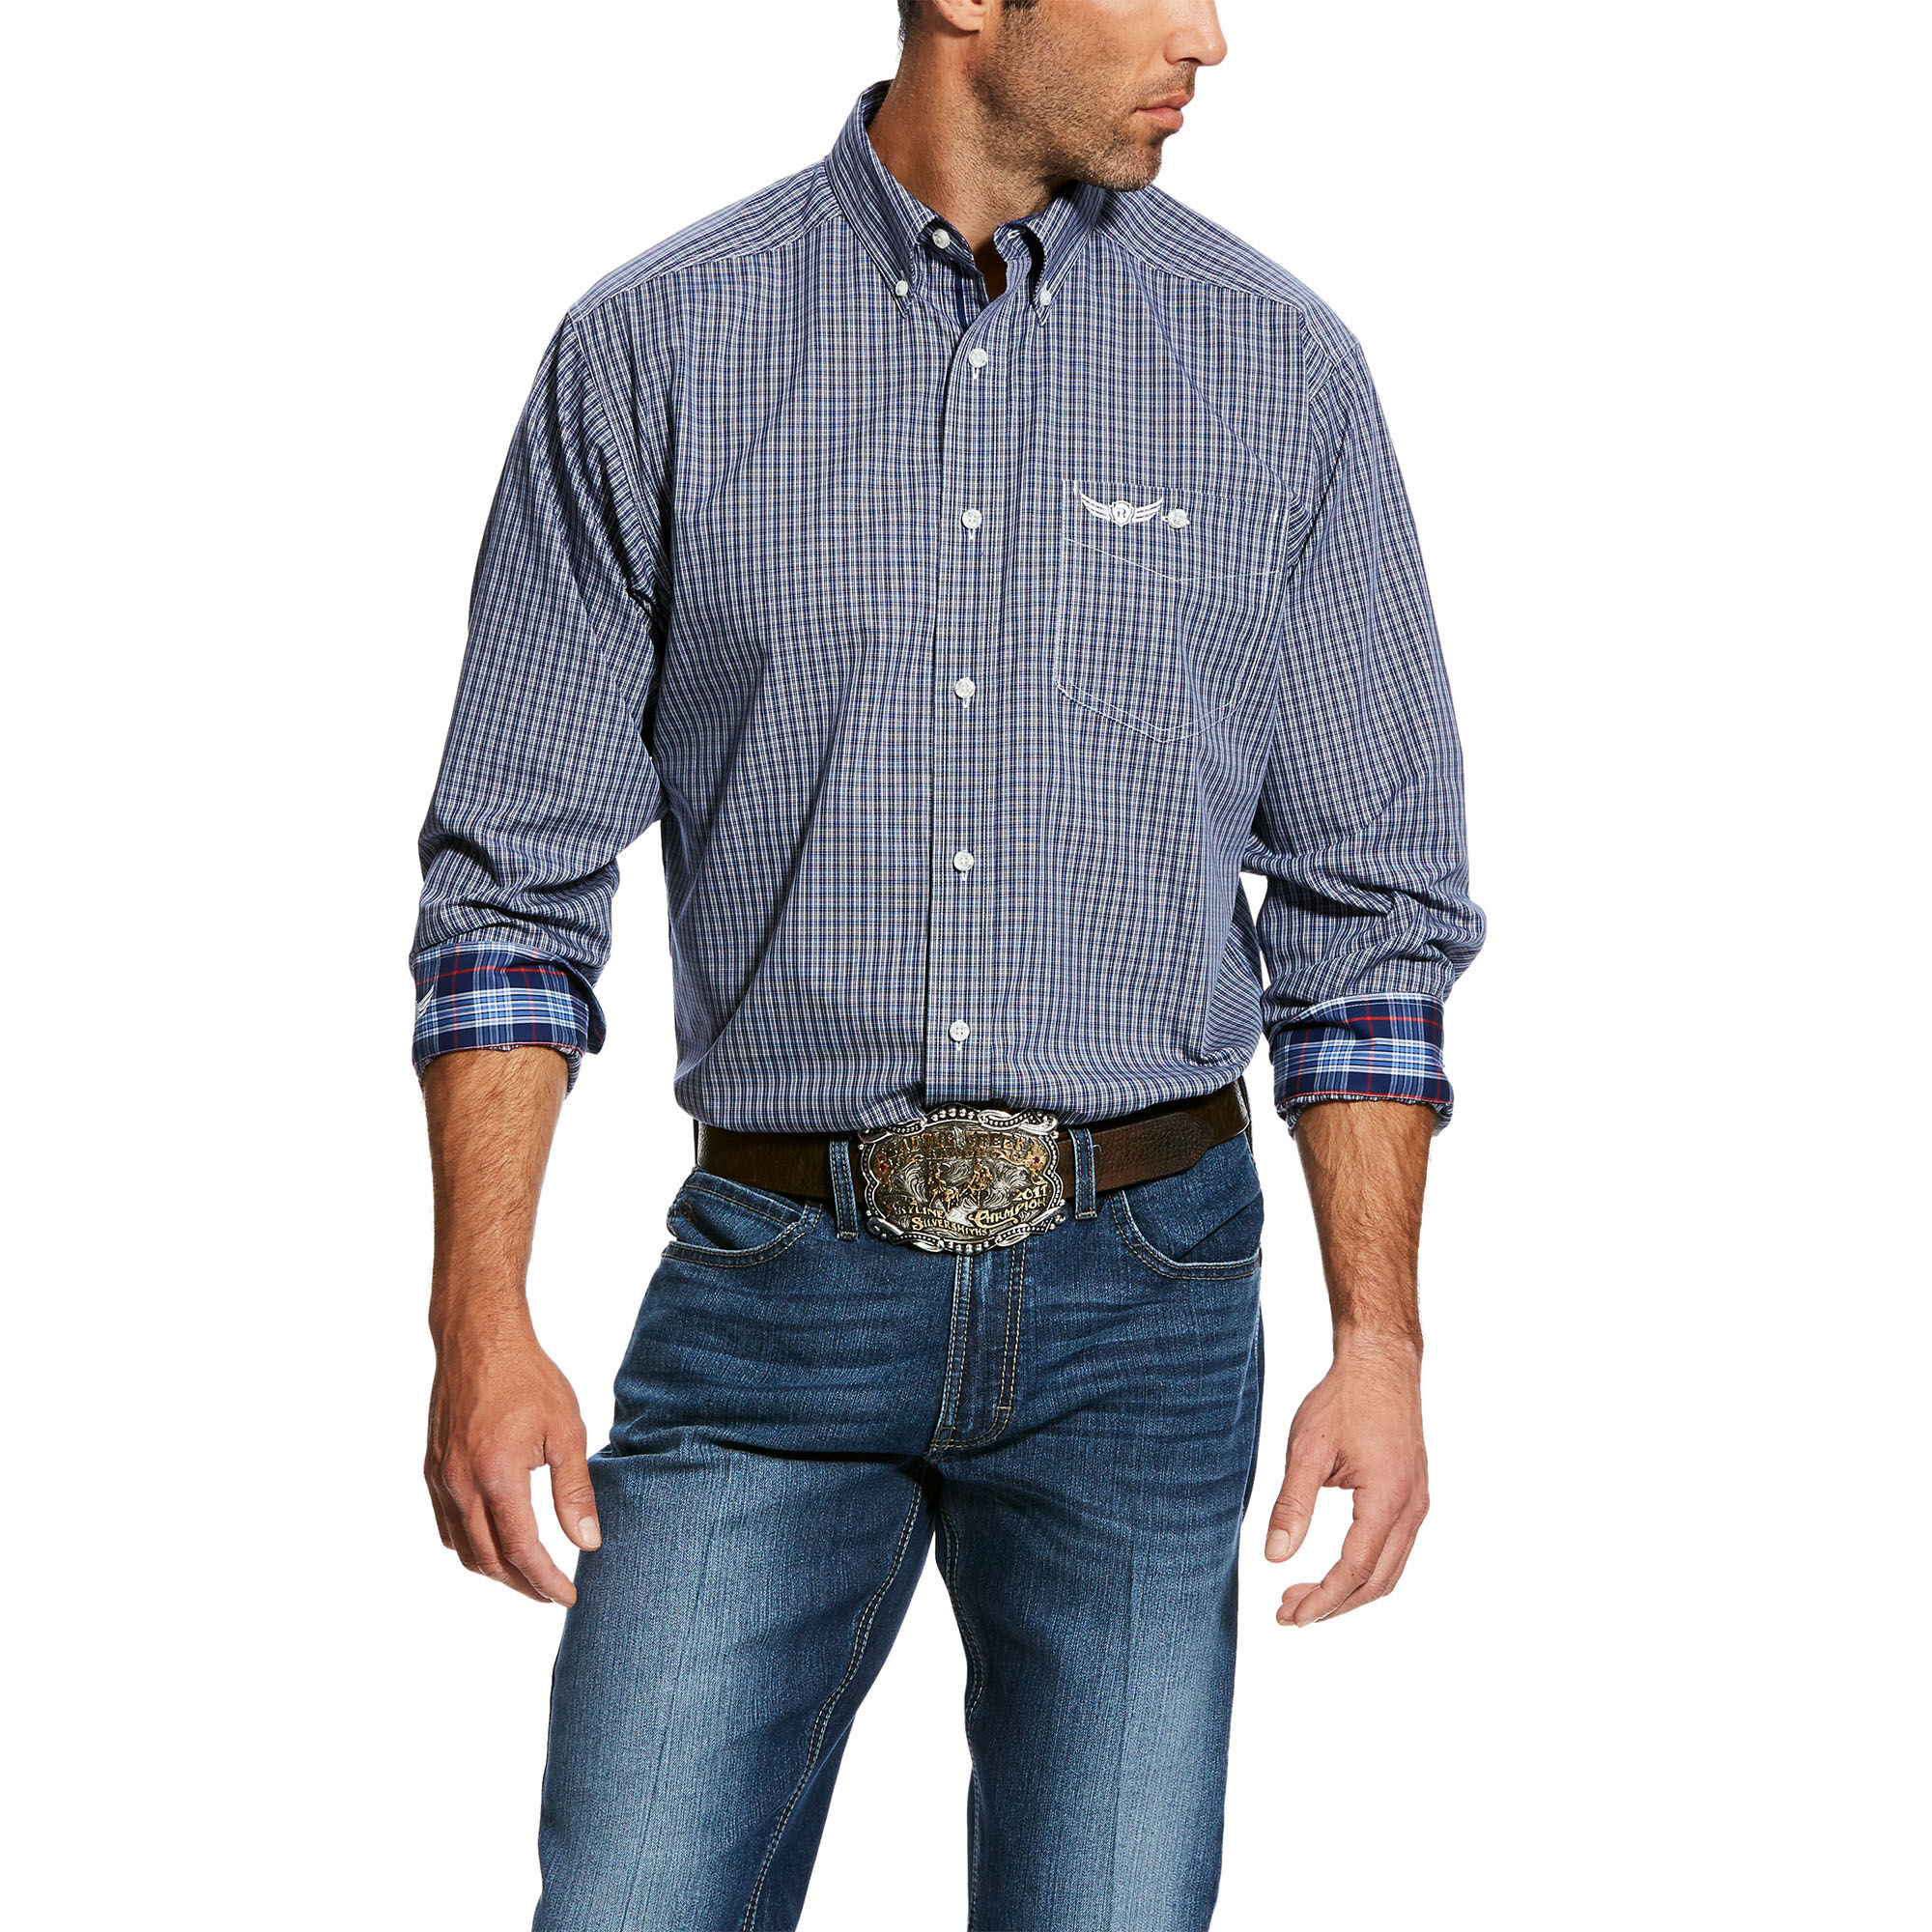 Relentless Honorable LS Plaid Shirt